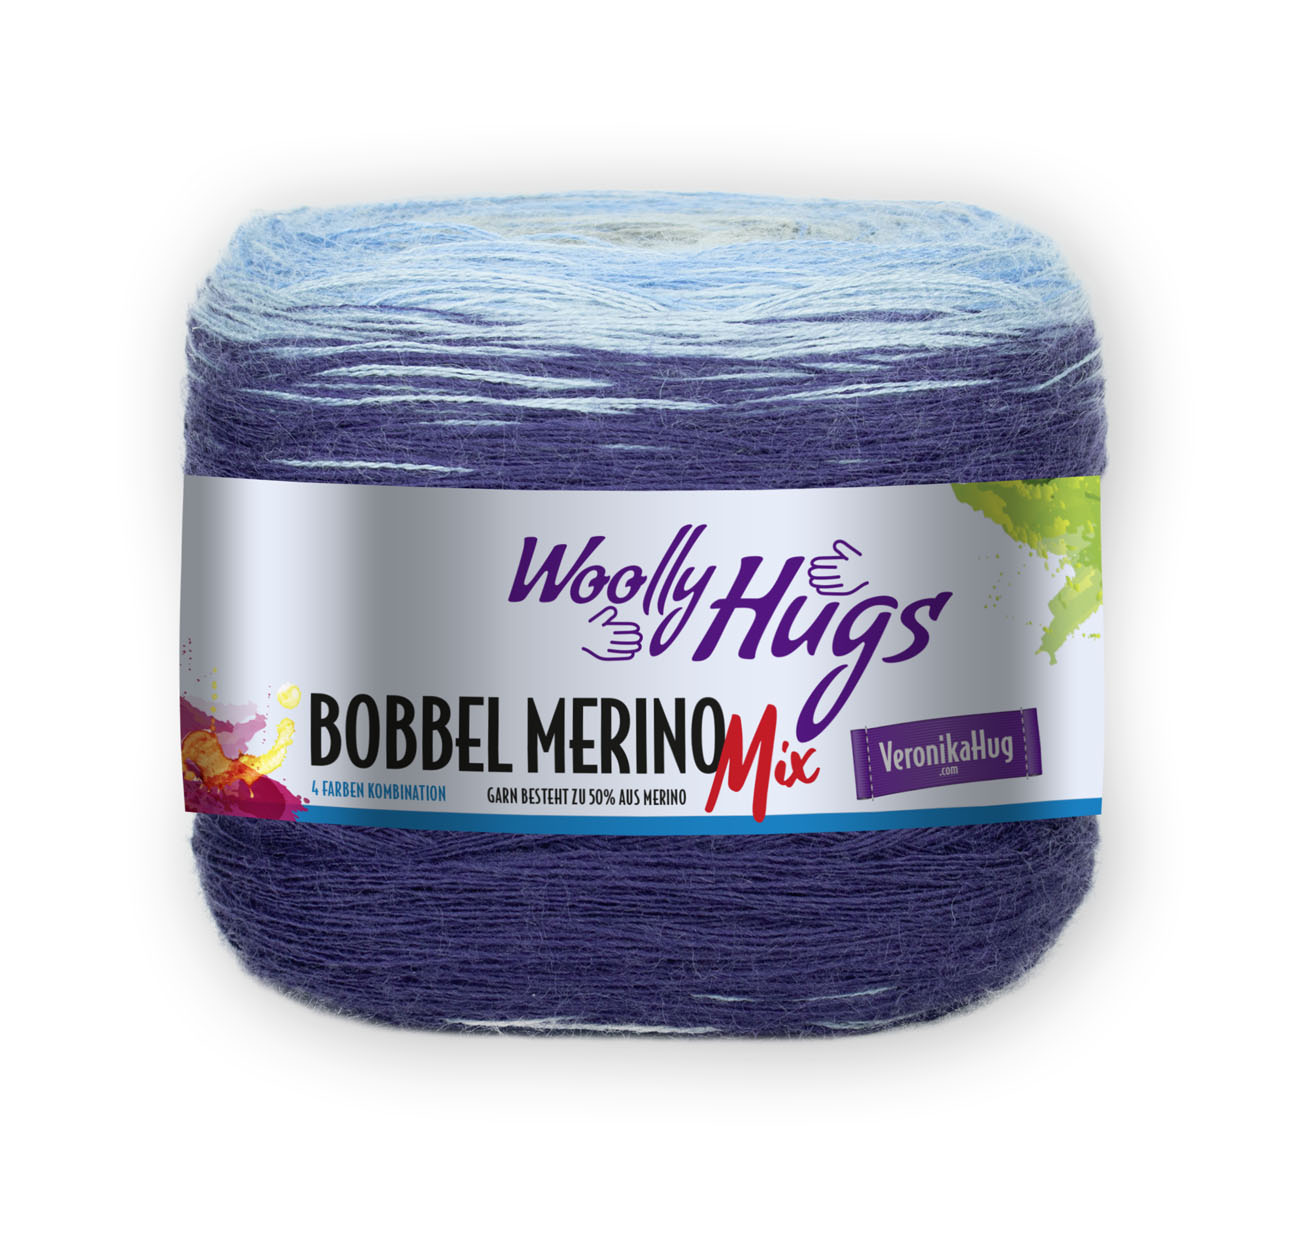 Woolly Hugs Bobbel Merinomix 708